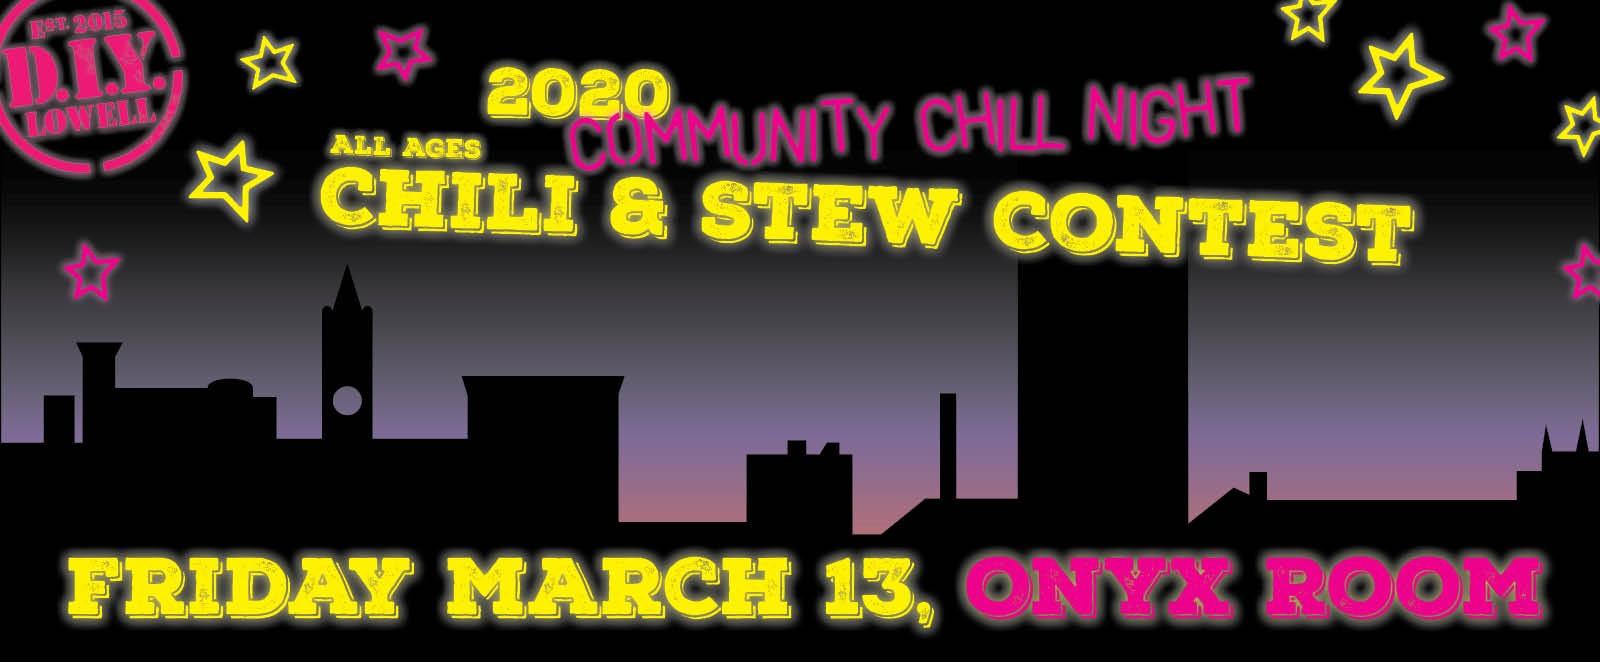 2020 Community Chill Night - Chili and Stew Contest